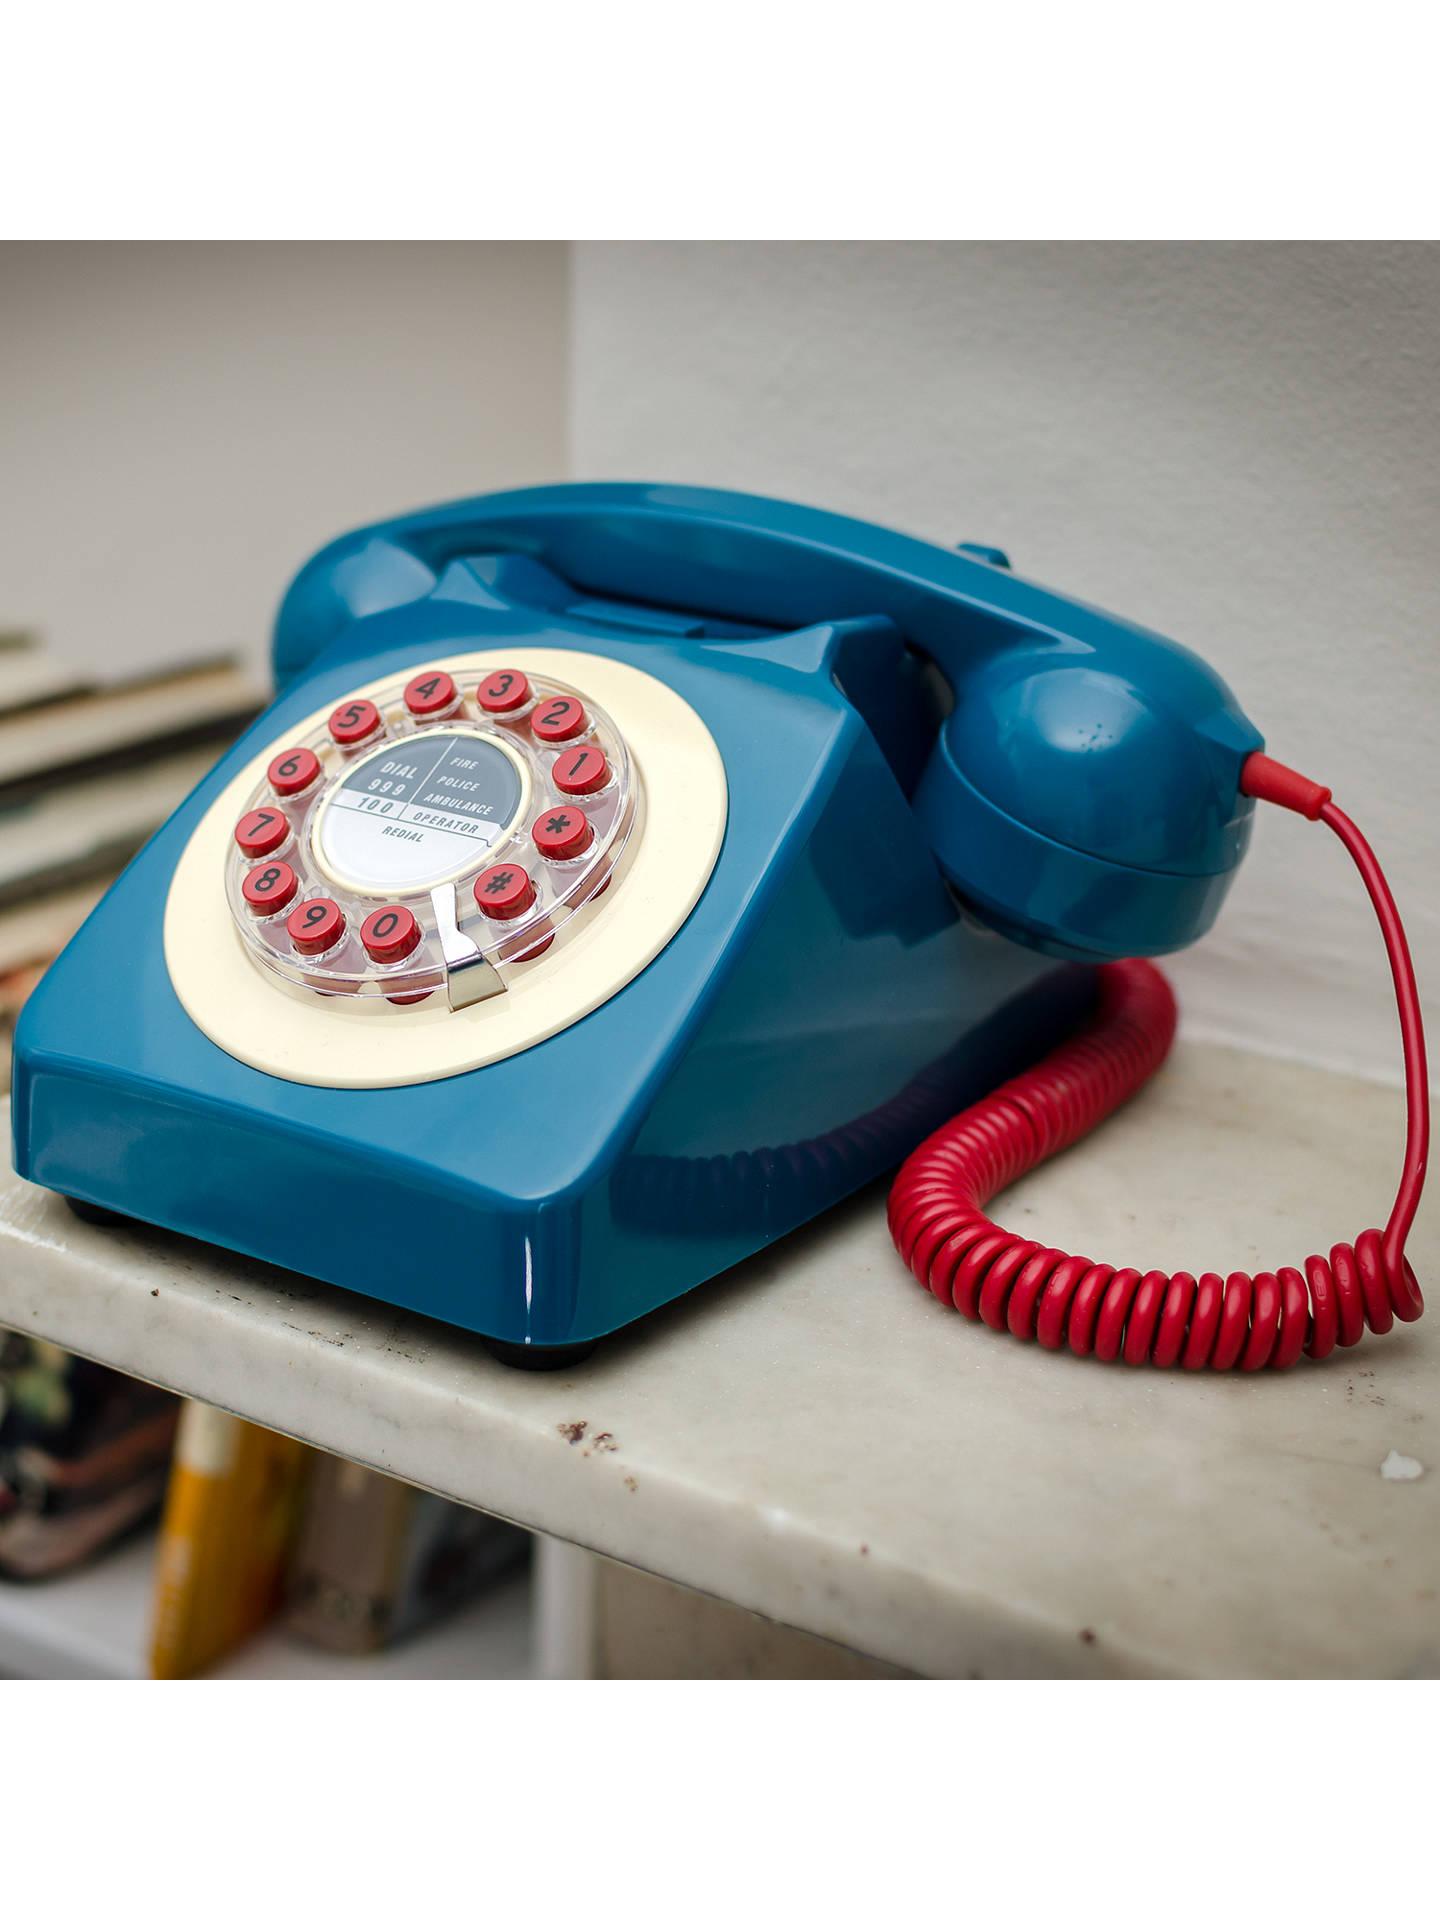 Wild & Wolf 746 1960s Corded Telephone, Petrol